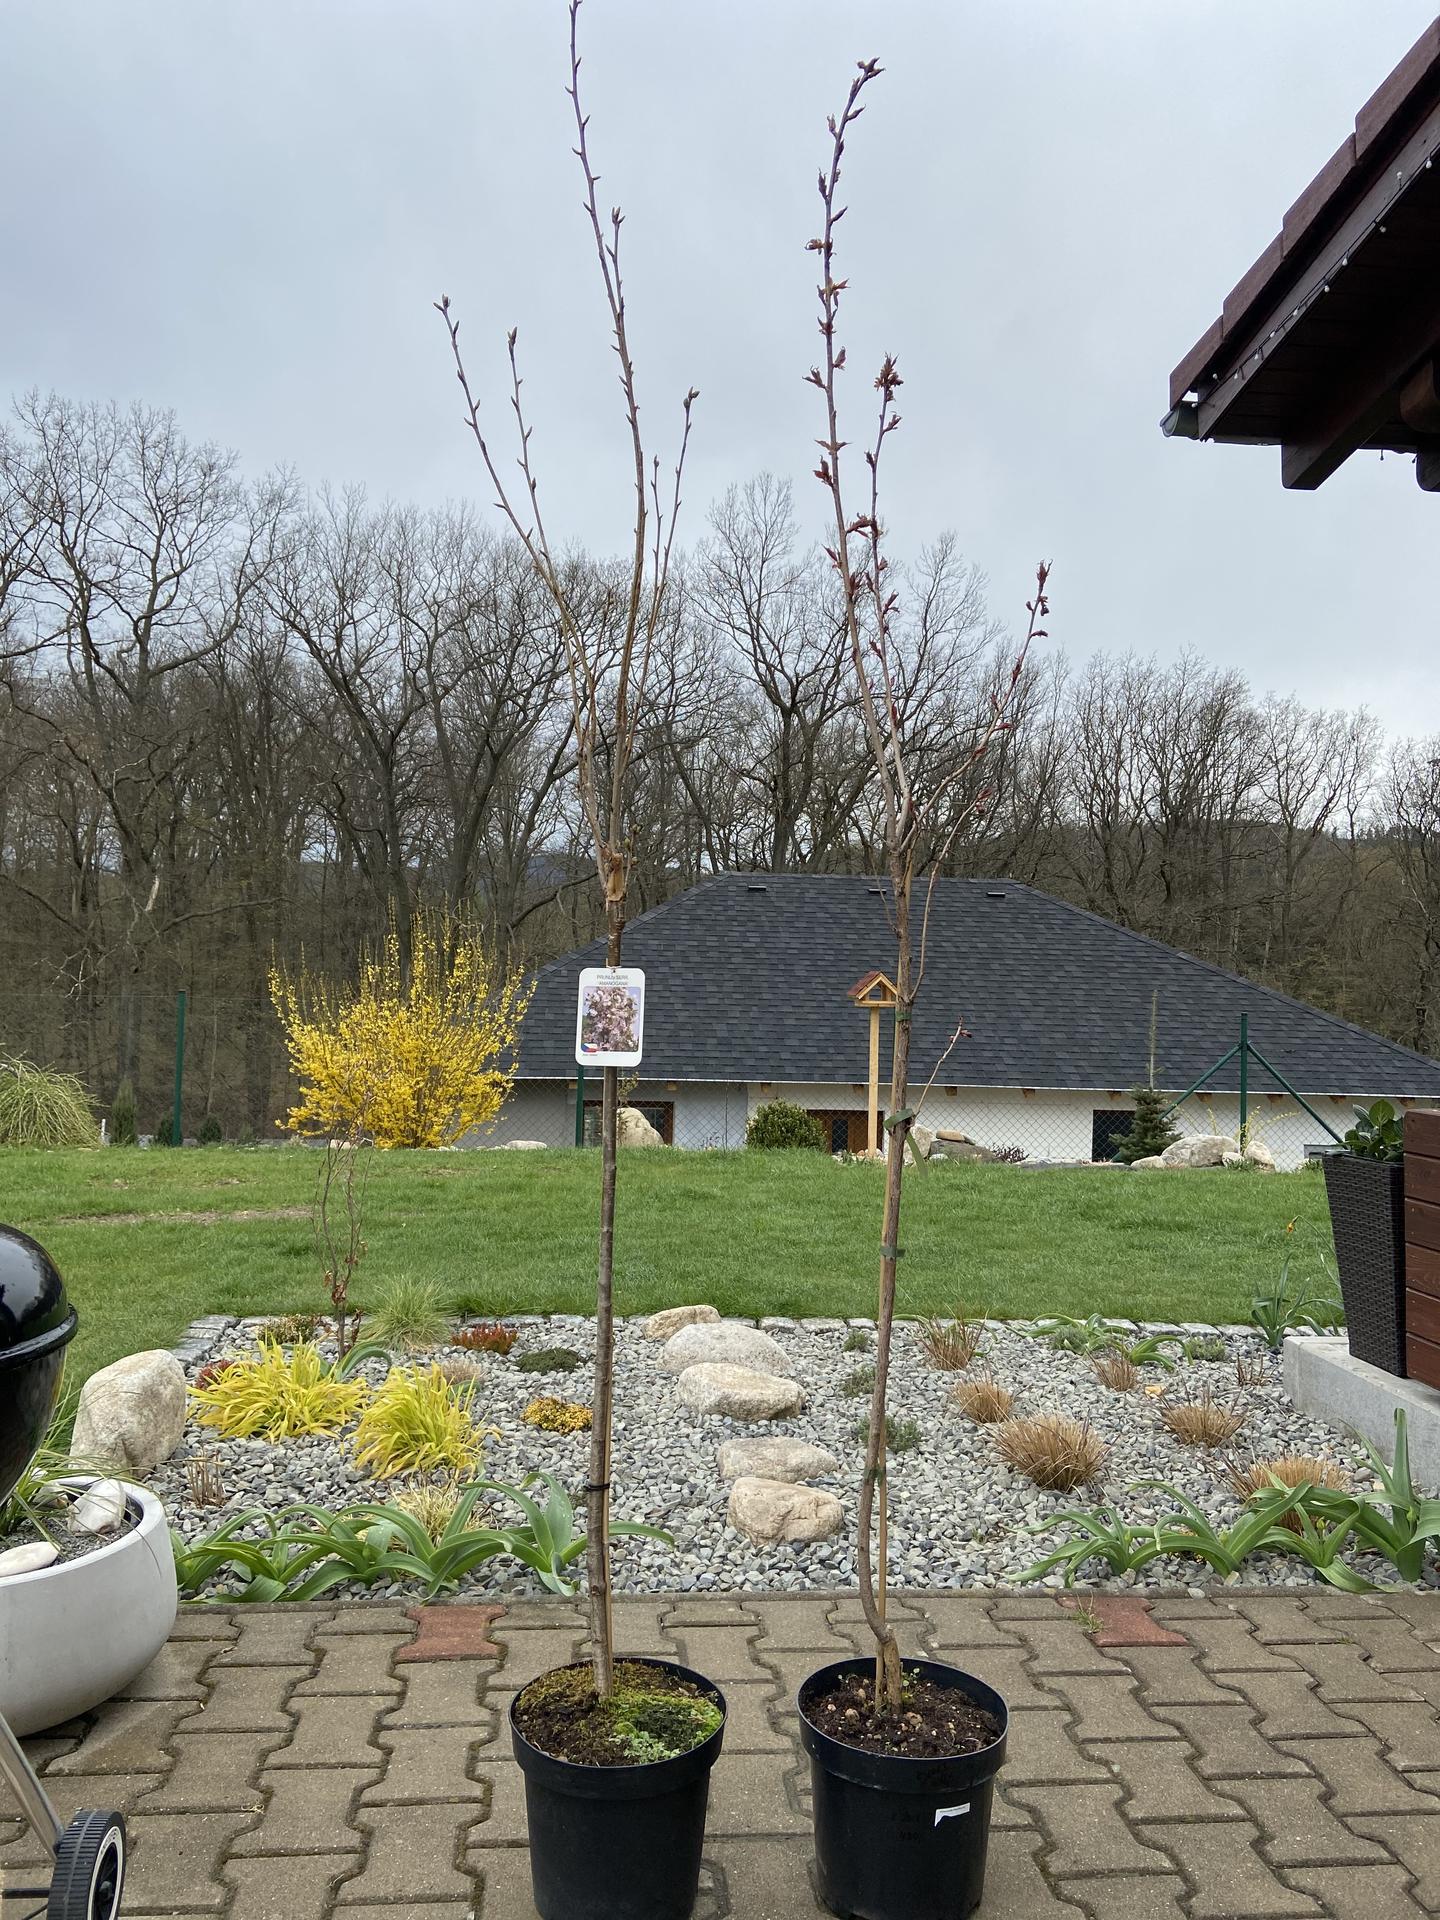 Pergola + zimní zahrada + zahrada - Obě prunusky